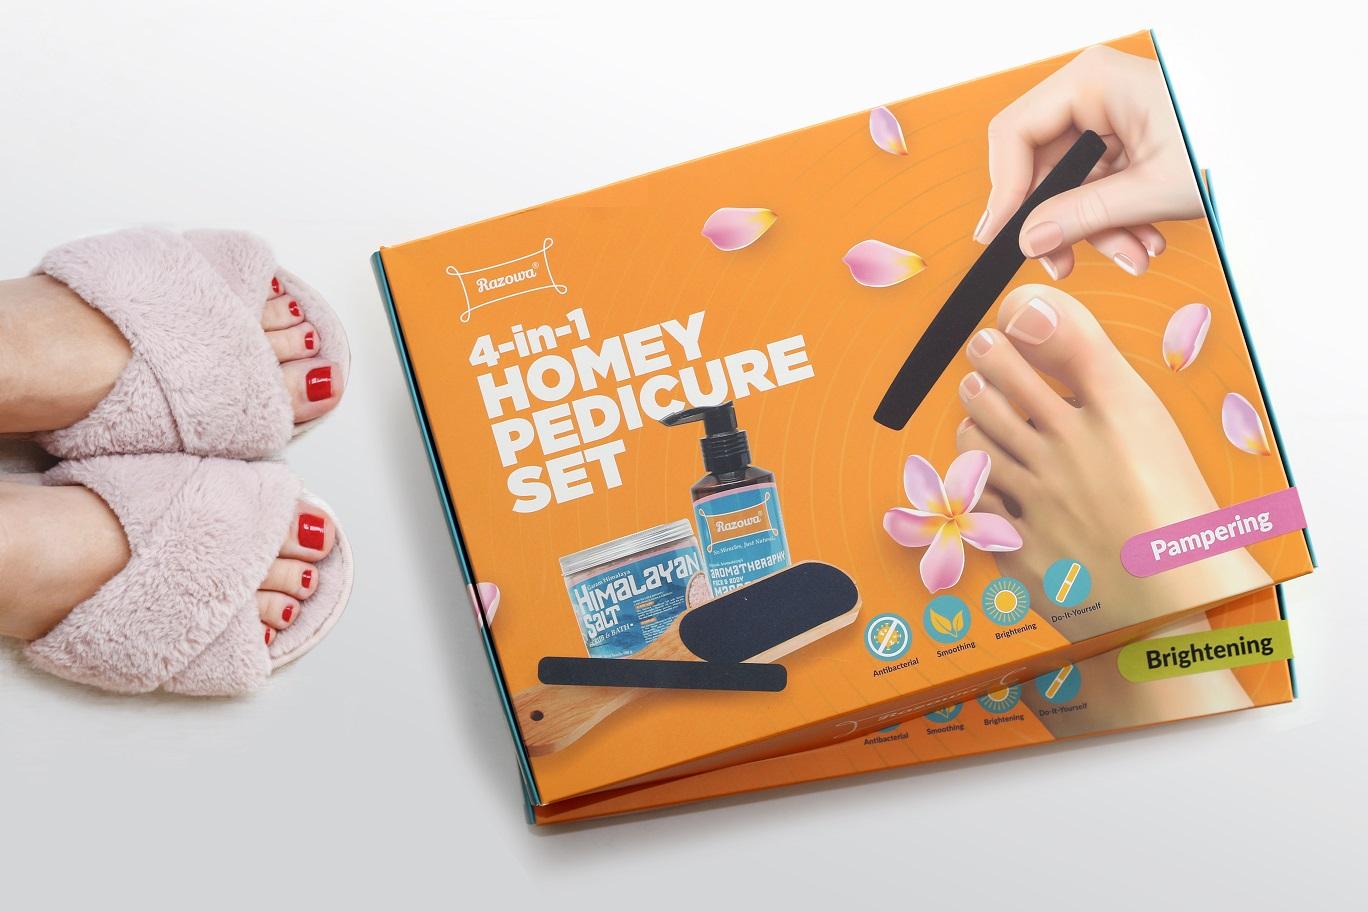 homey-pedicure-set